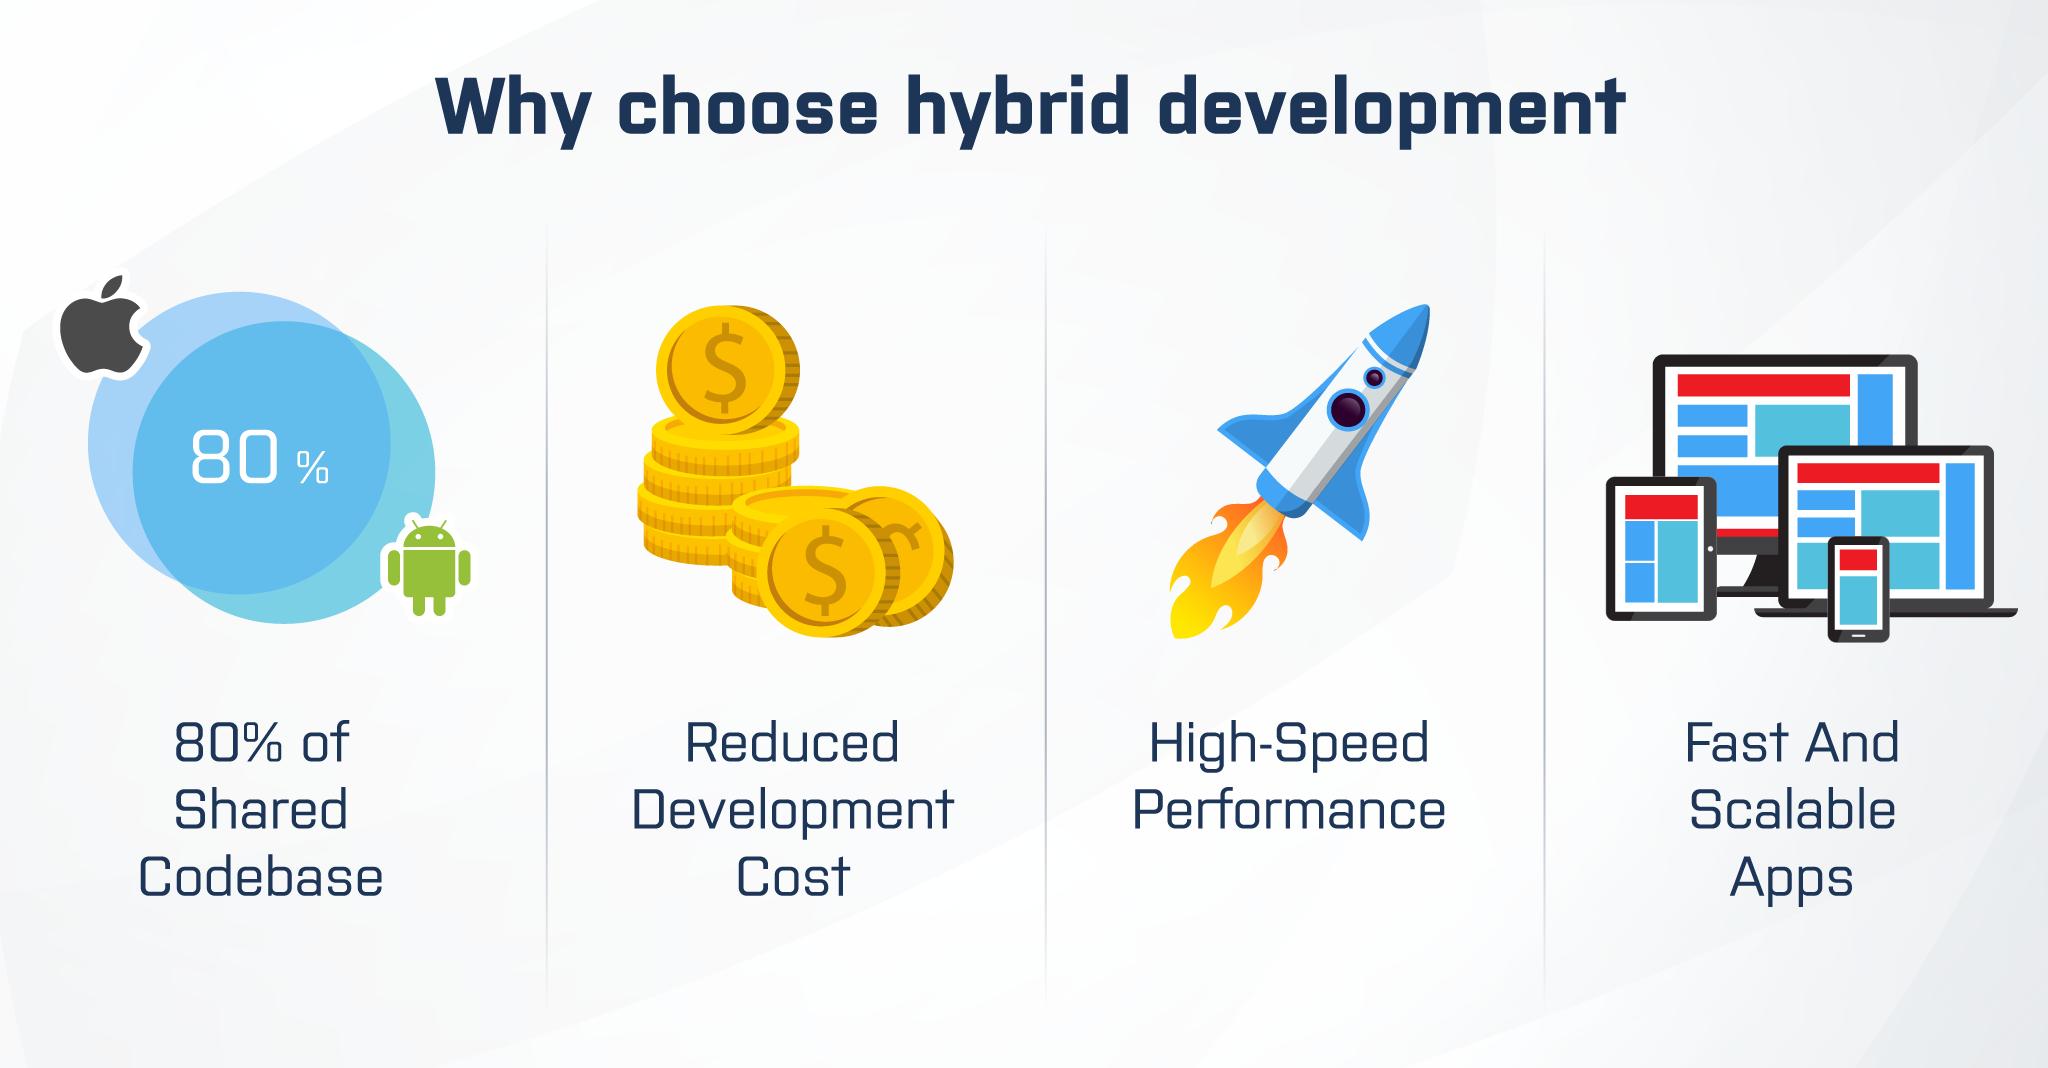 hybrid apps' advantages